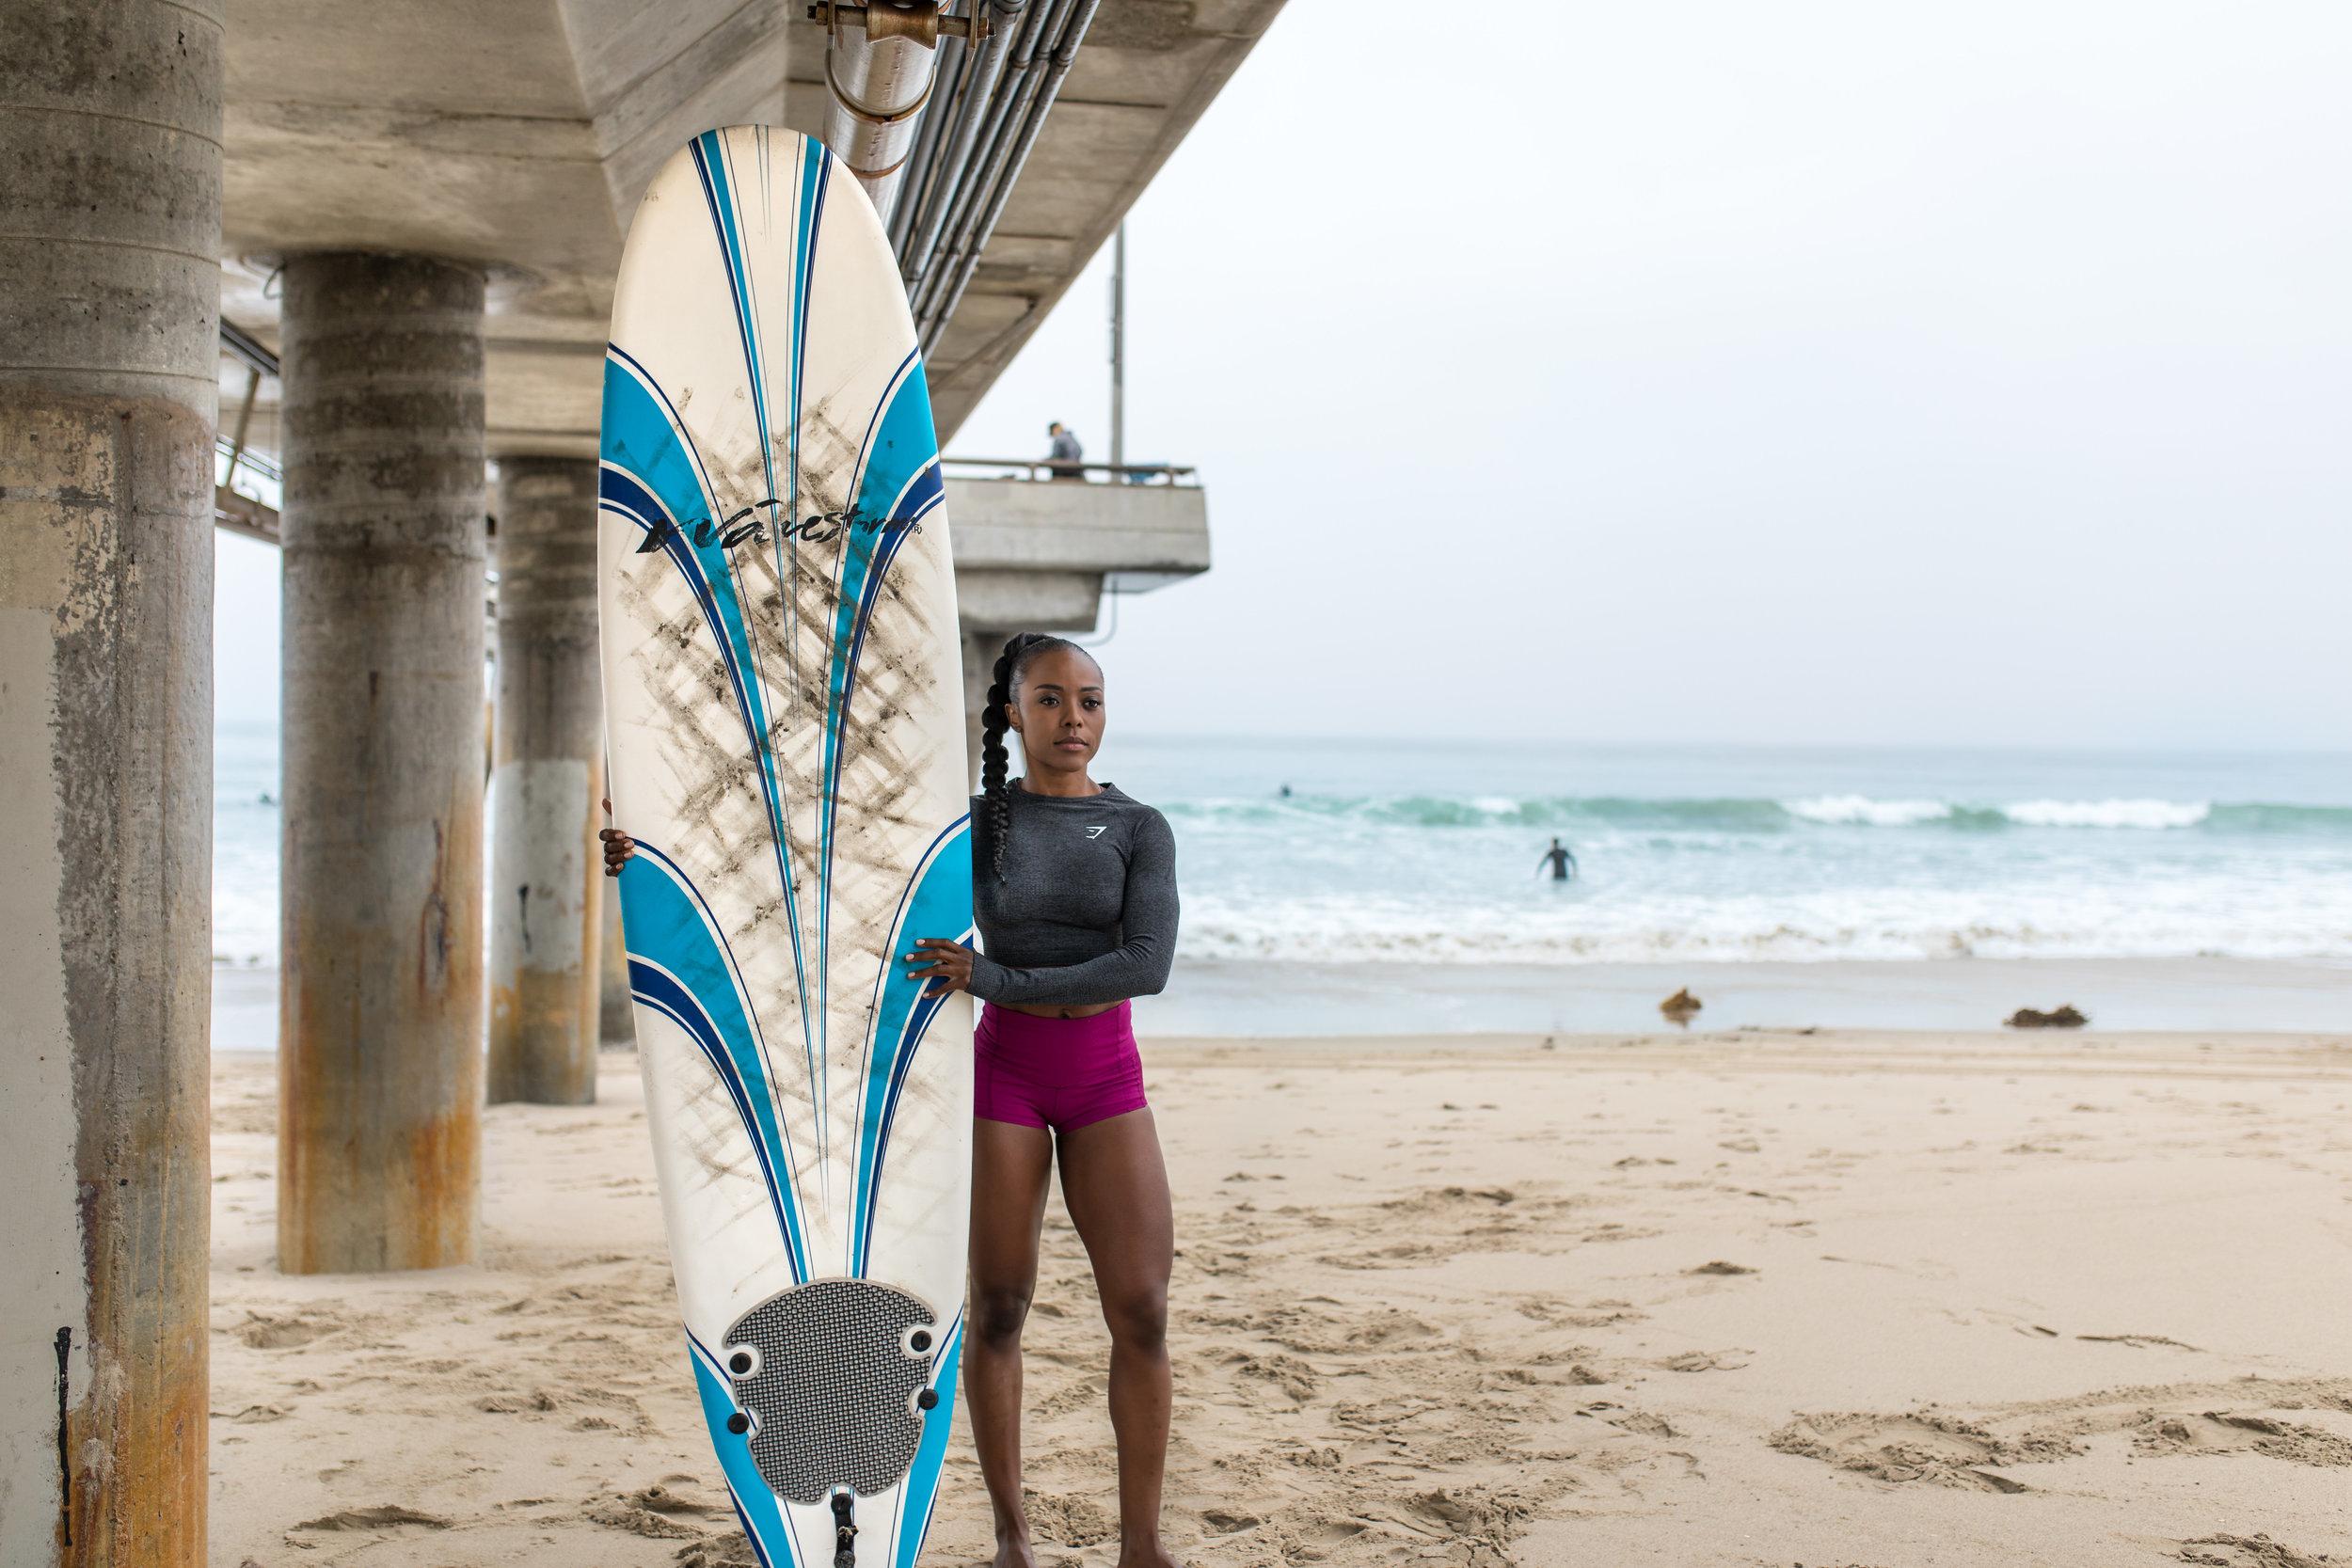 Livestrong_Surf Workout-3.JPG